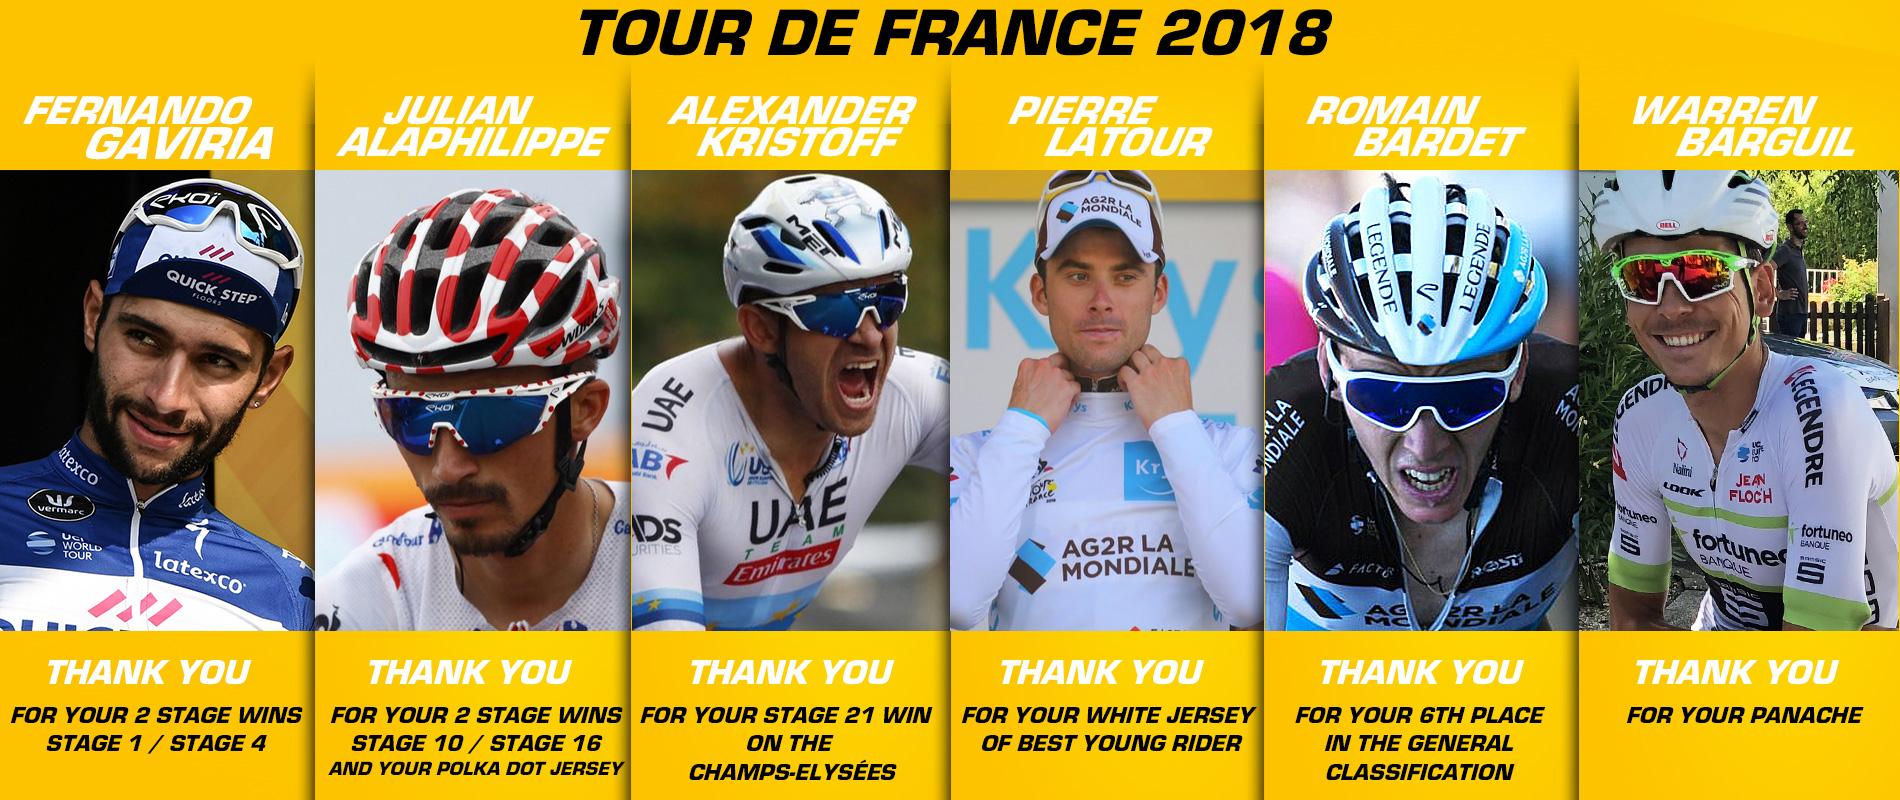 Tour de France 2018 Merci EKOI